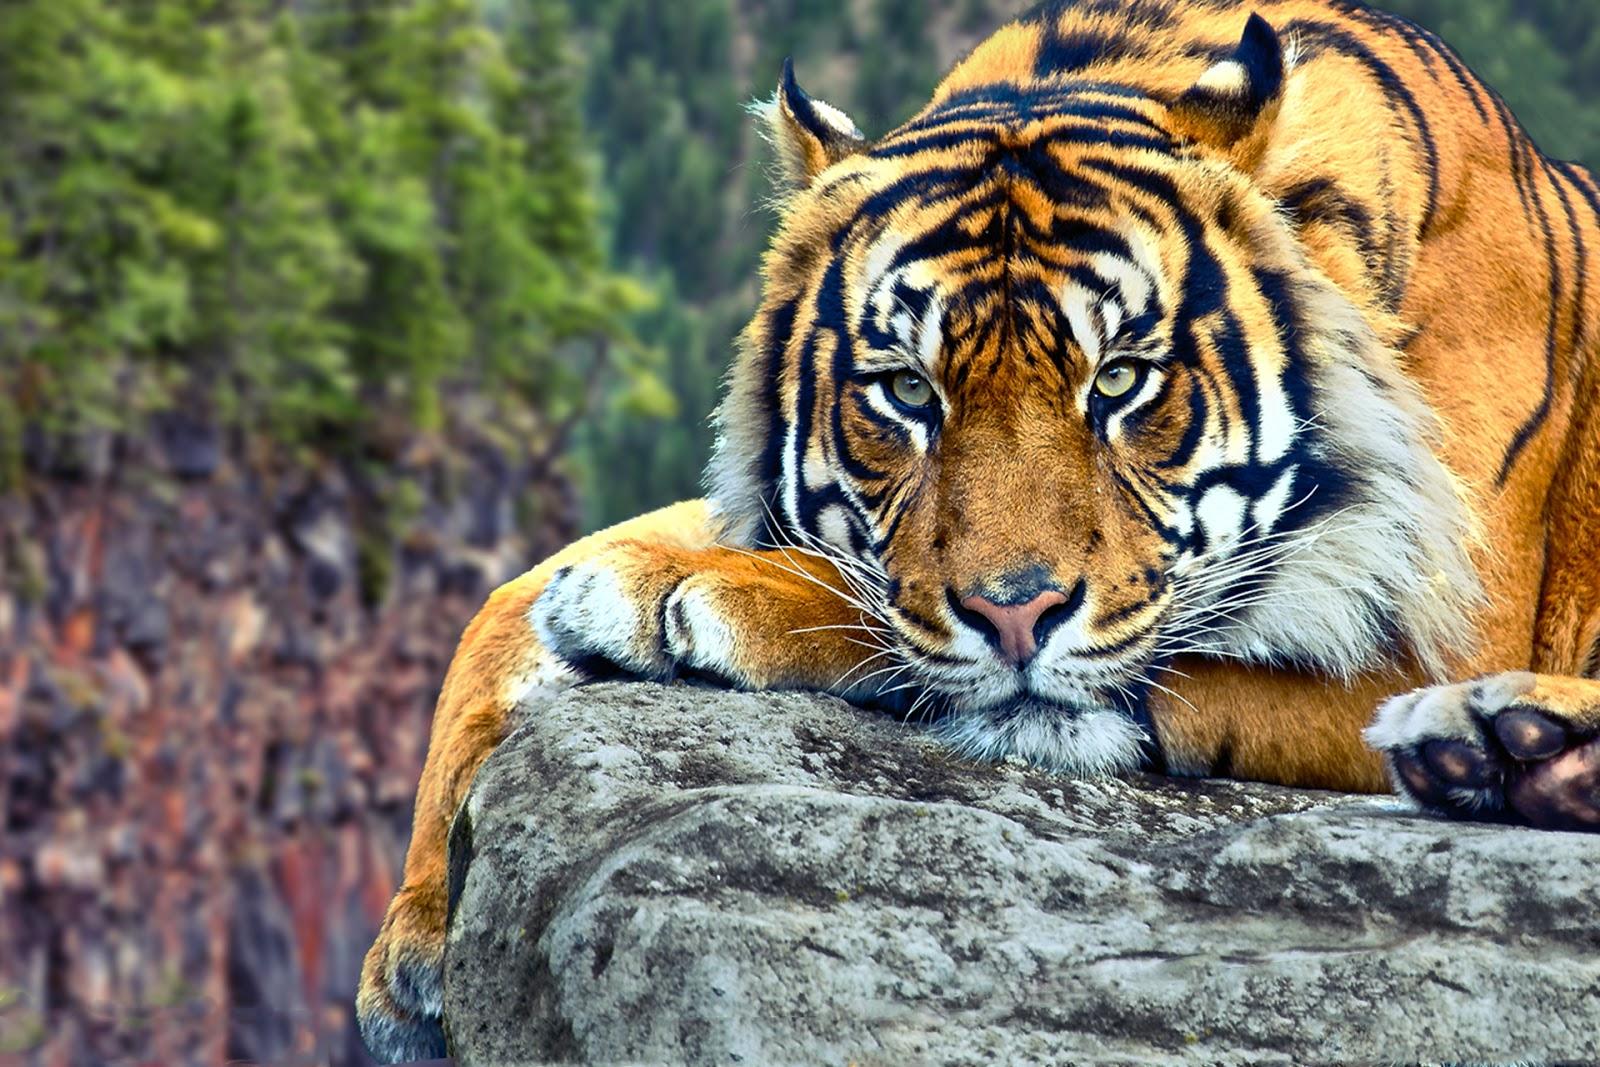 tiger wallpapers for desktop hd (57 wallpapers) – adorable wallpapers